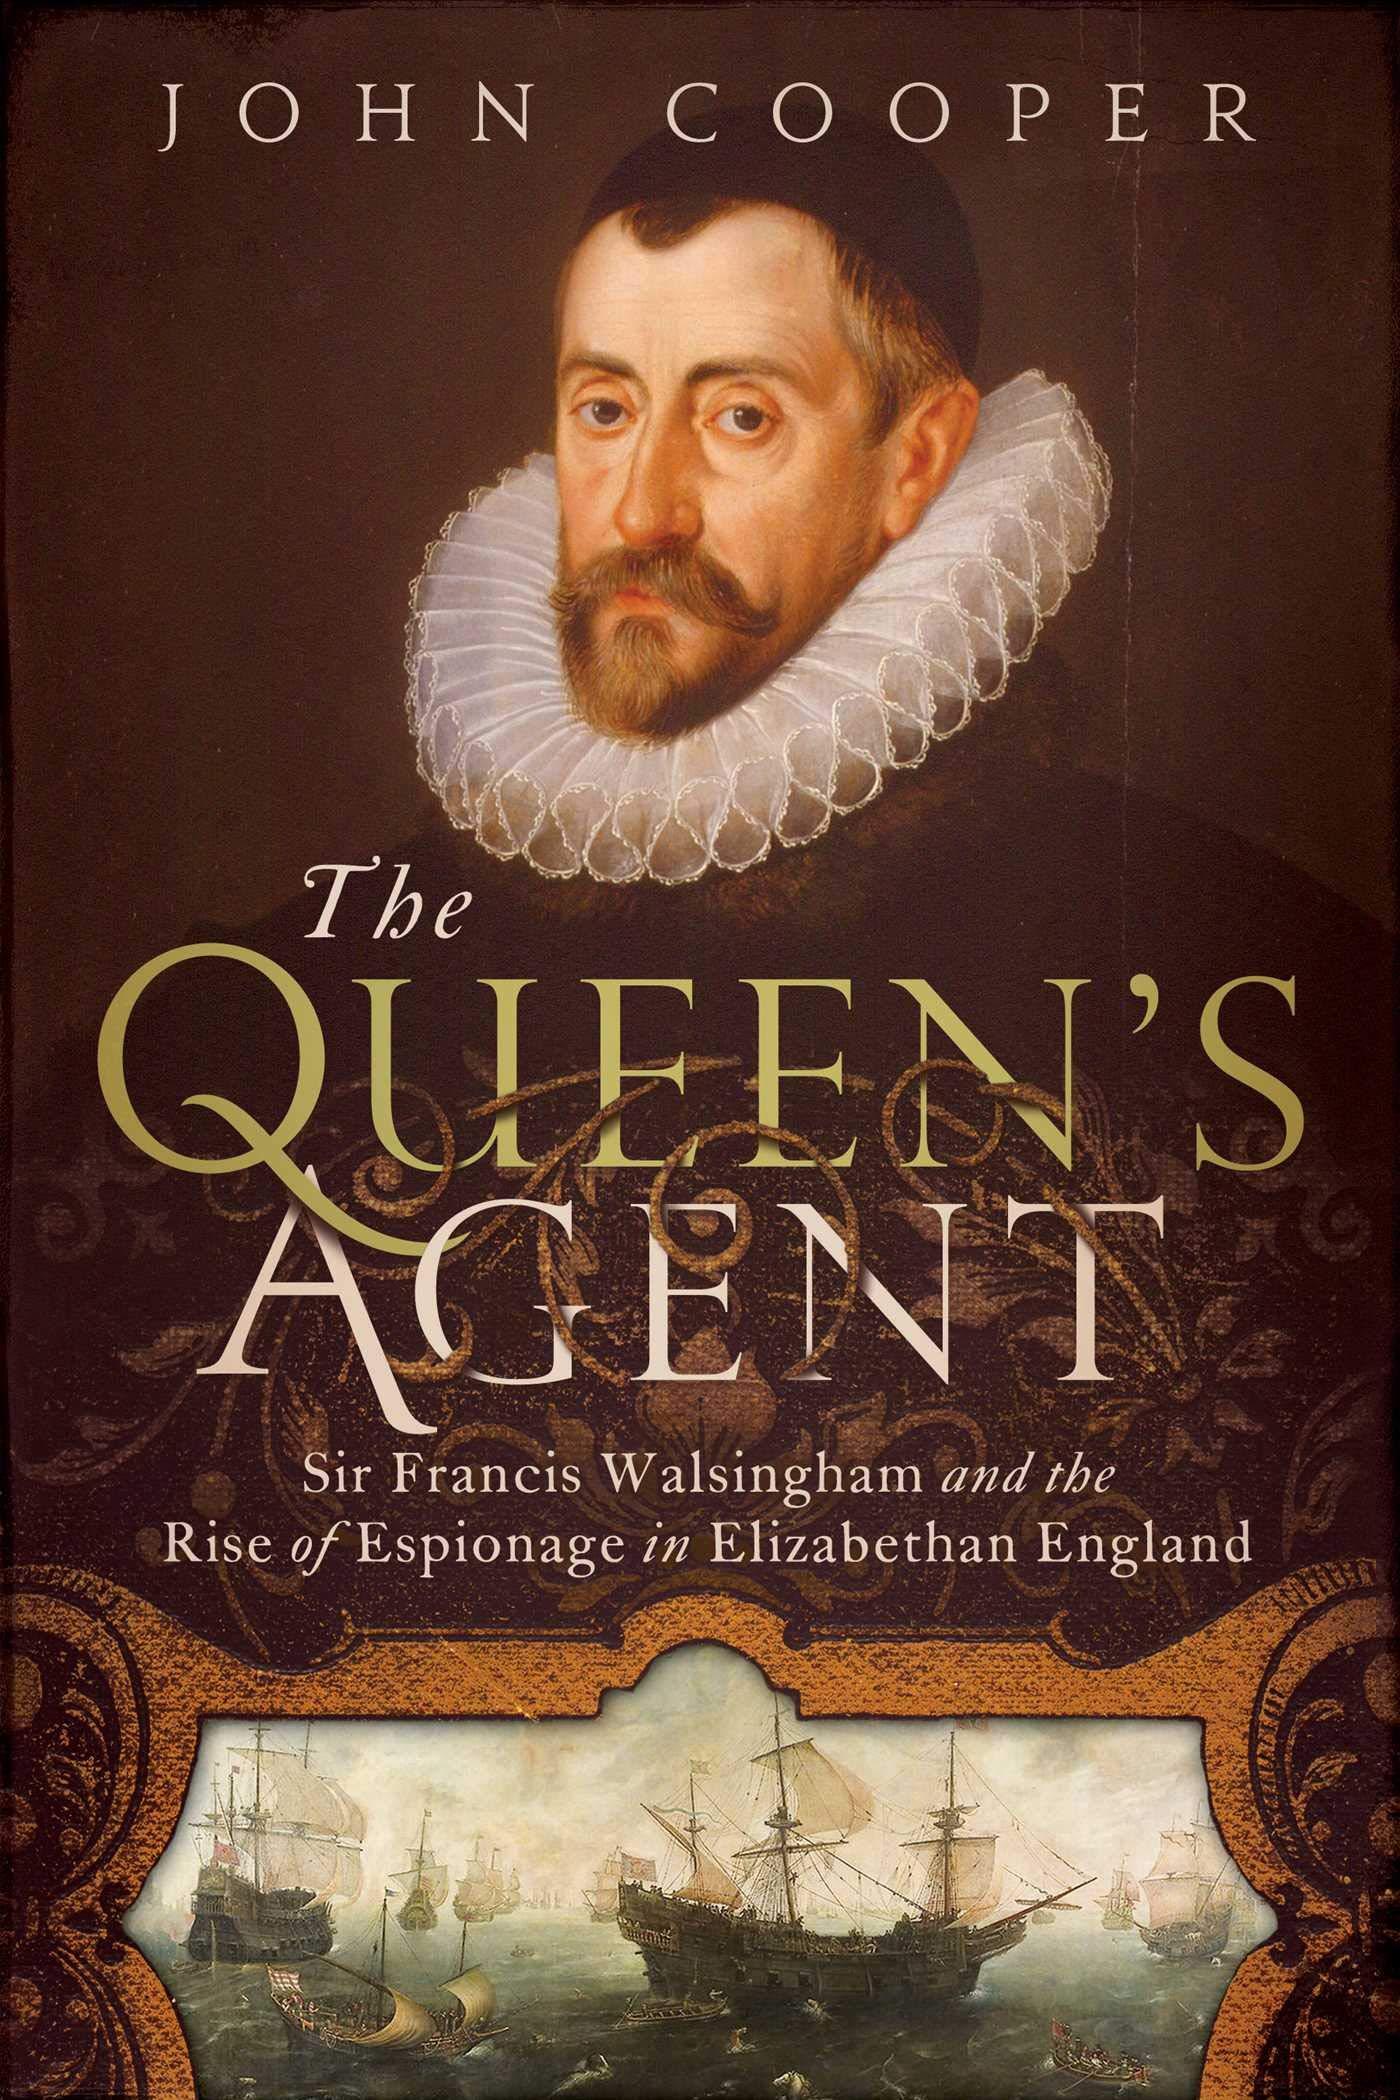 The Queens Agent: Sir Francis Walsingham and the Rise of Espionage in Elizabethan England: Amazon.es: Cooper, John: Libros en idiomas extranjeros